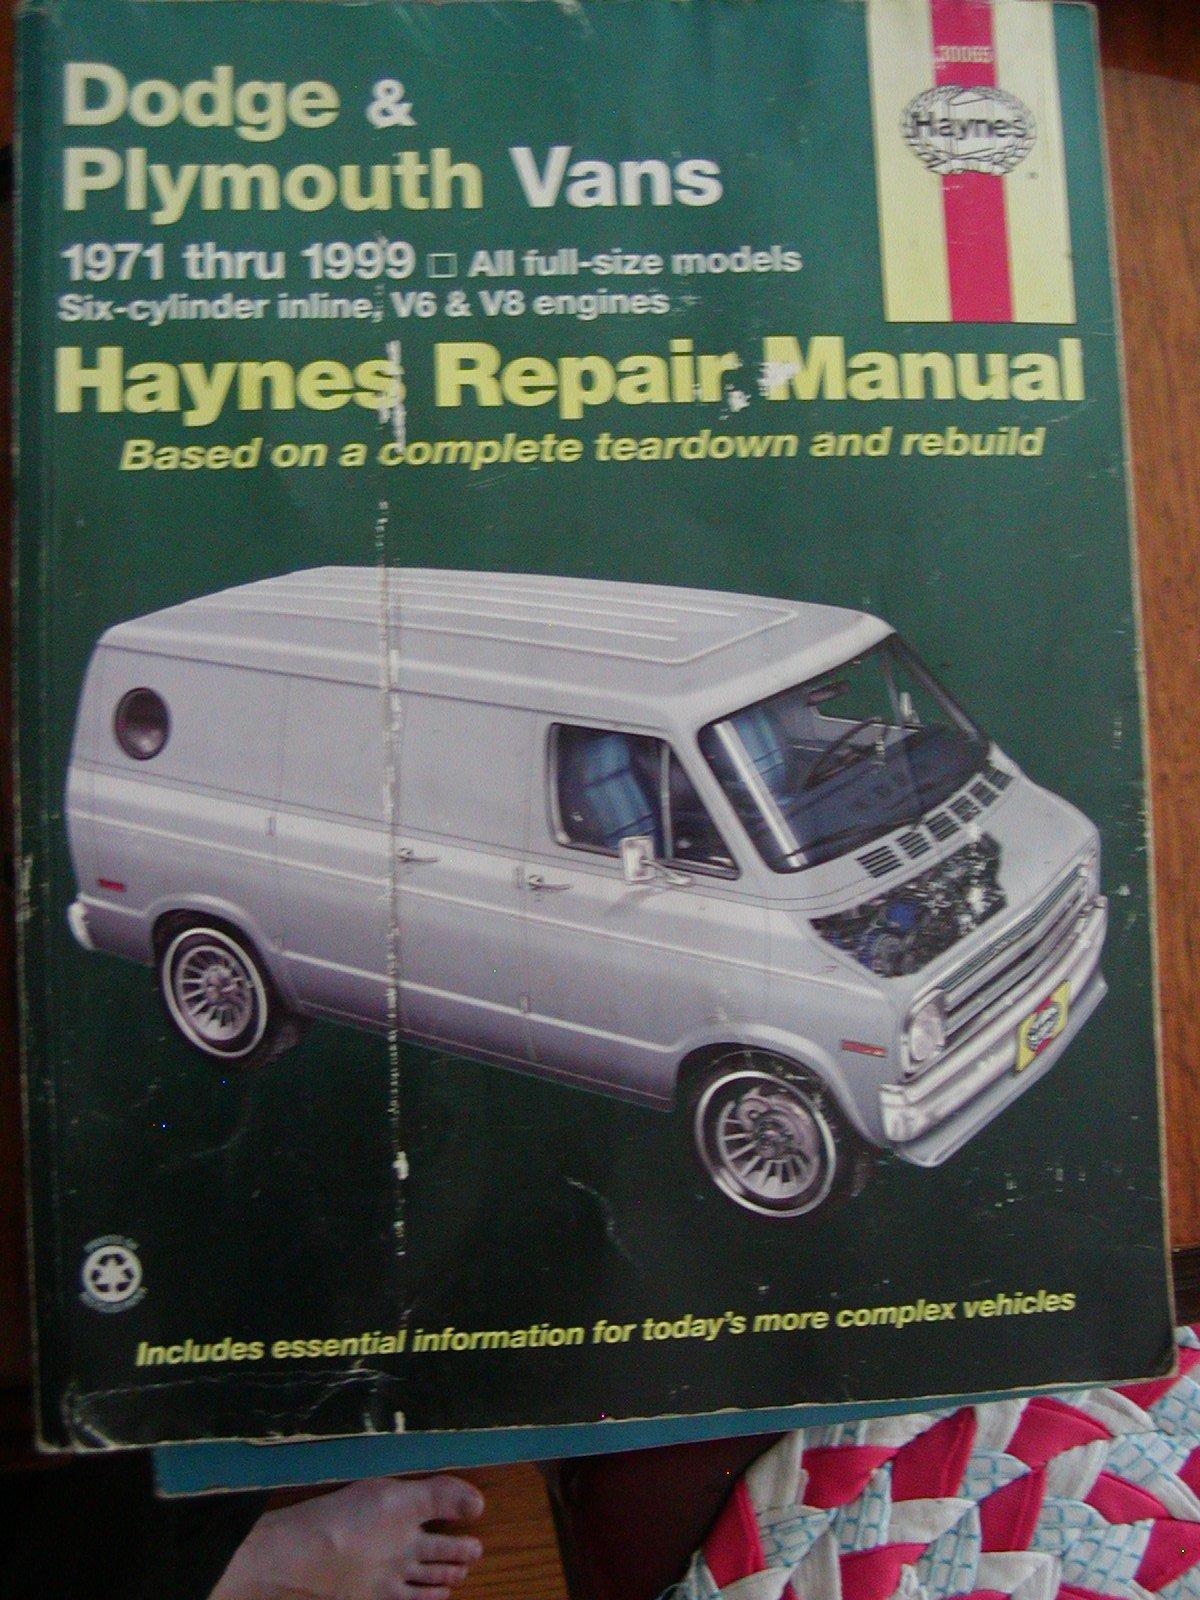 Dodge & Plymouth Vans Automotive Repair Manual: 1971 Thru 1999, All  Full-Size Models, Six-Cylinder Inline, V6 & V8 Engines: Rob; Haynes, John  H. Maddox: ...